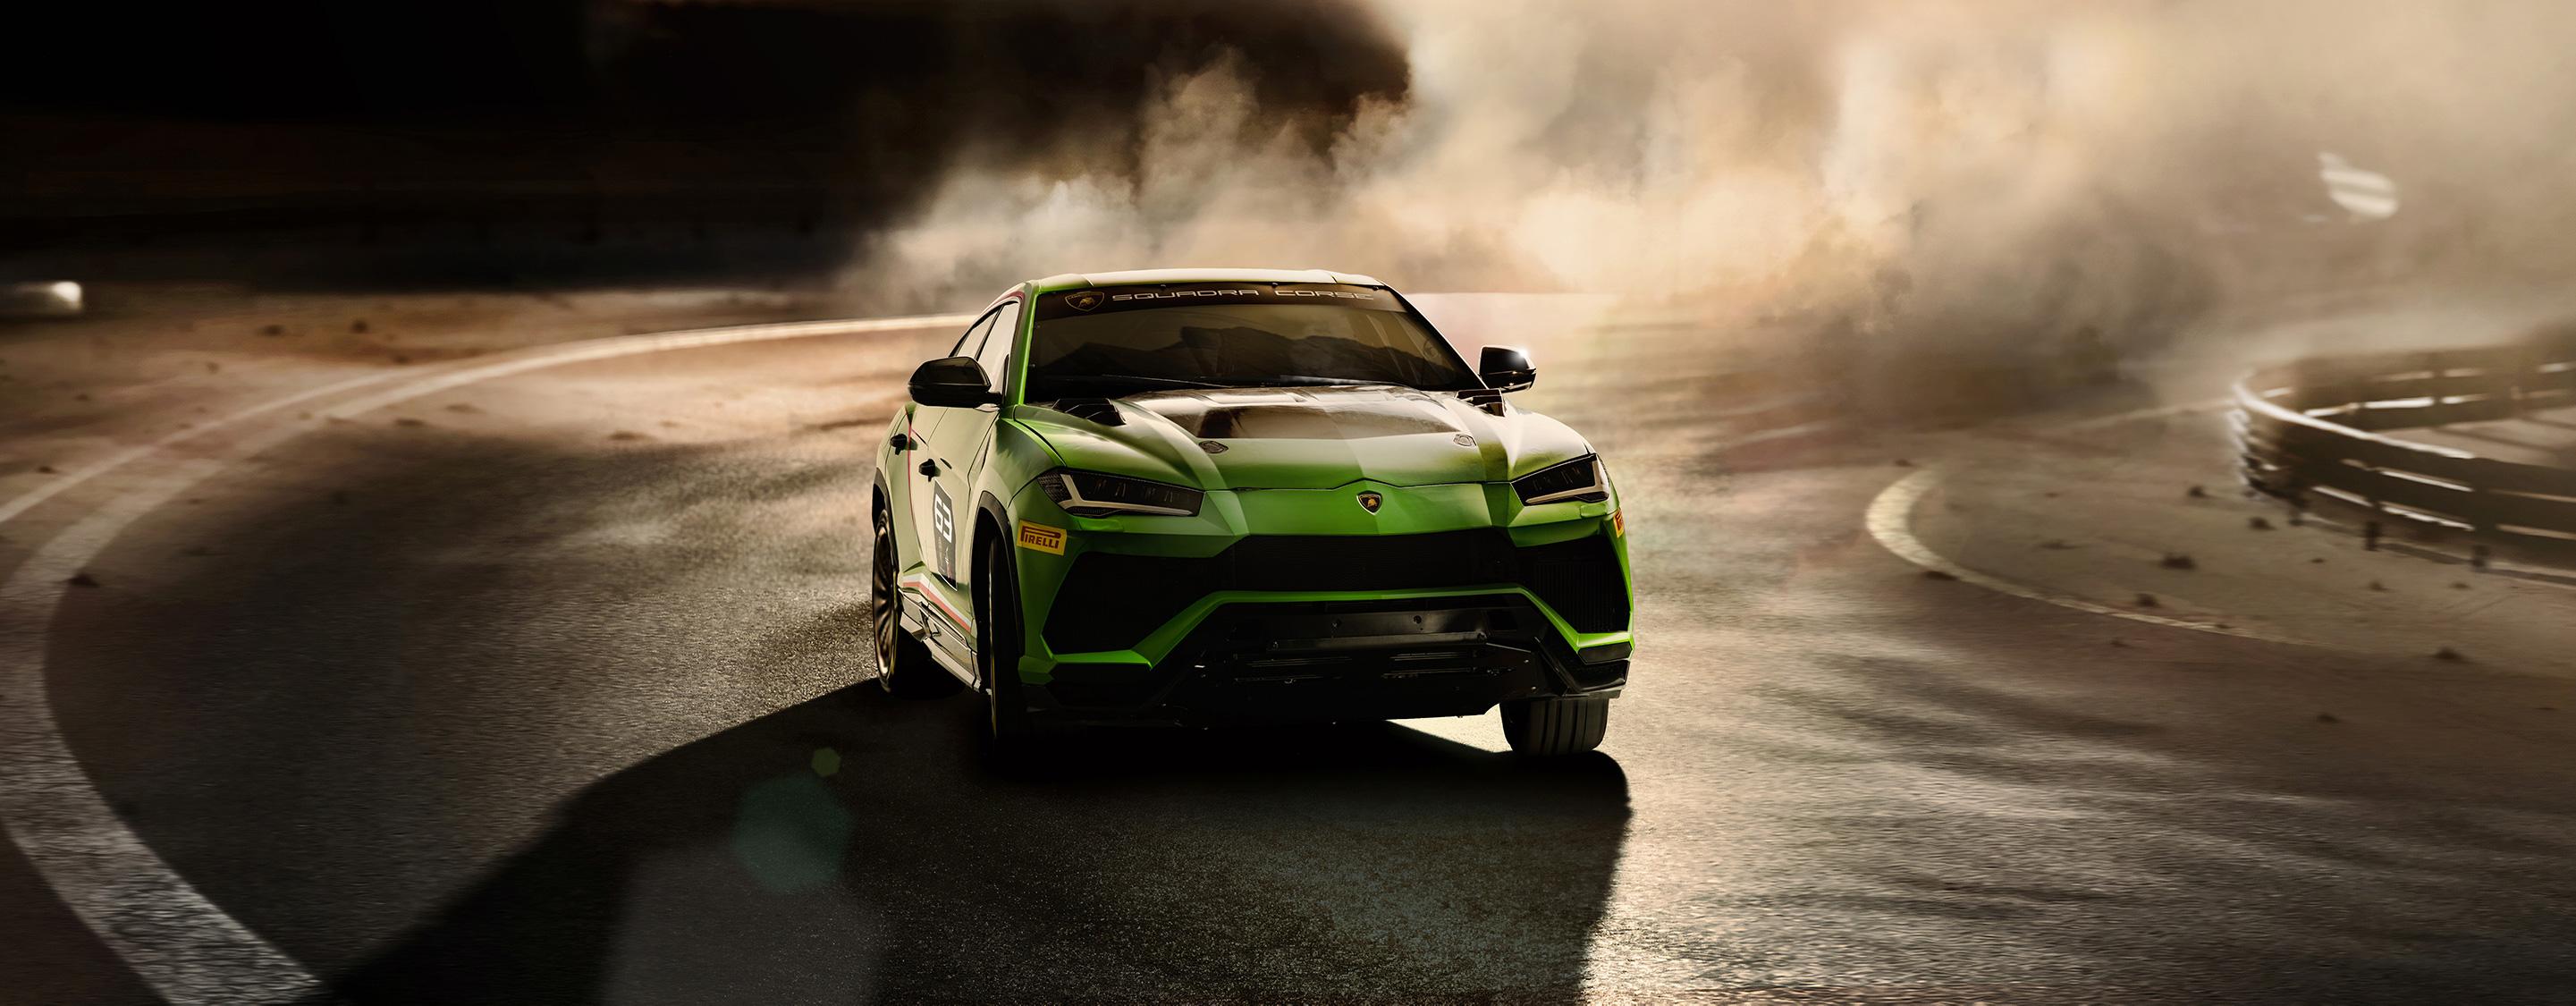 TrackWorthy - Lamborghini Urus ST-X Concept (1)